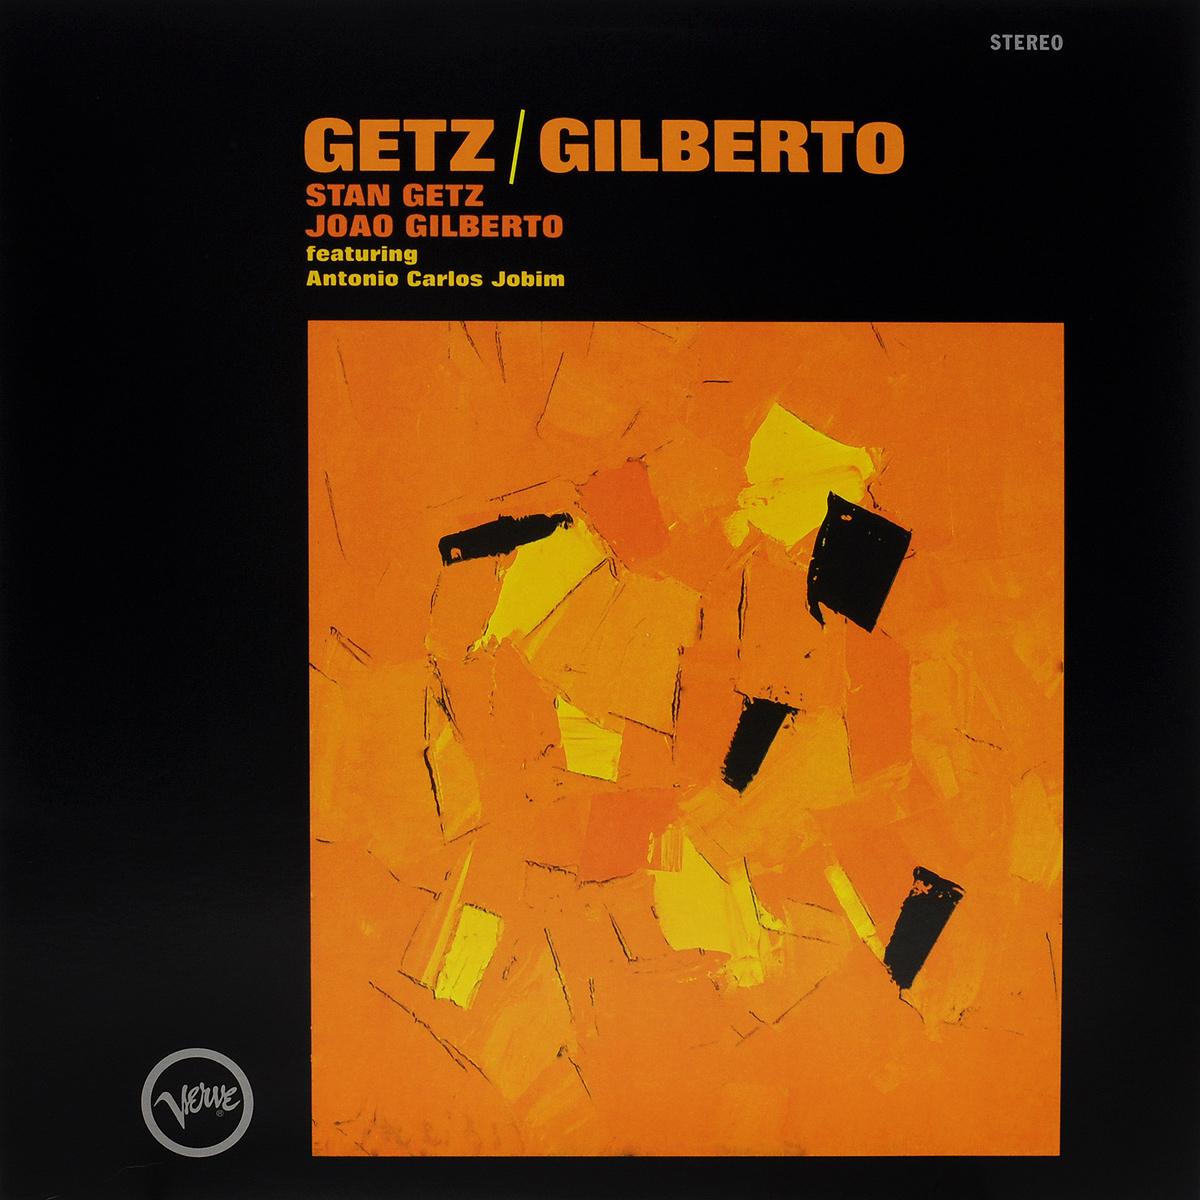 Стэн Гетц,Жоао Жильберто,Антонио Карлос Жобим Stan Getz & Joao Gilberto. Getz / Gilberto (LP) gilberto gil bandadois